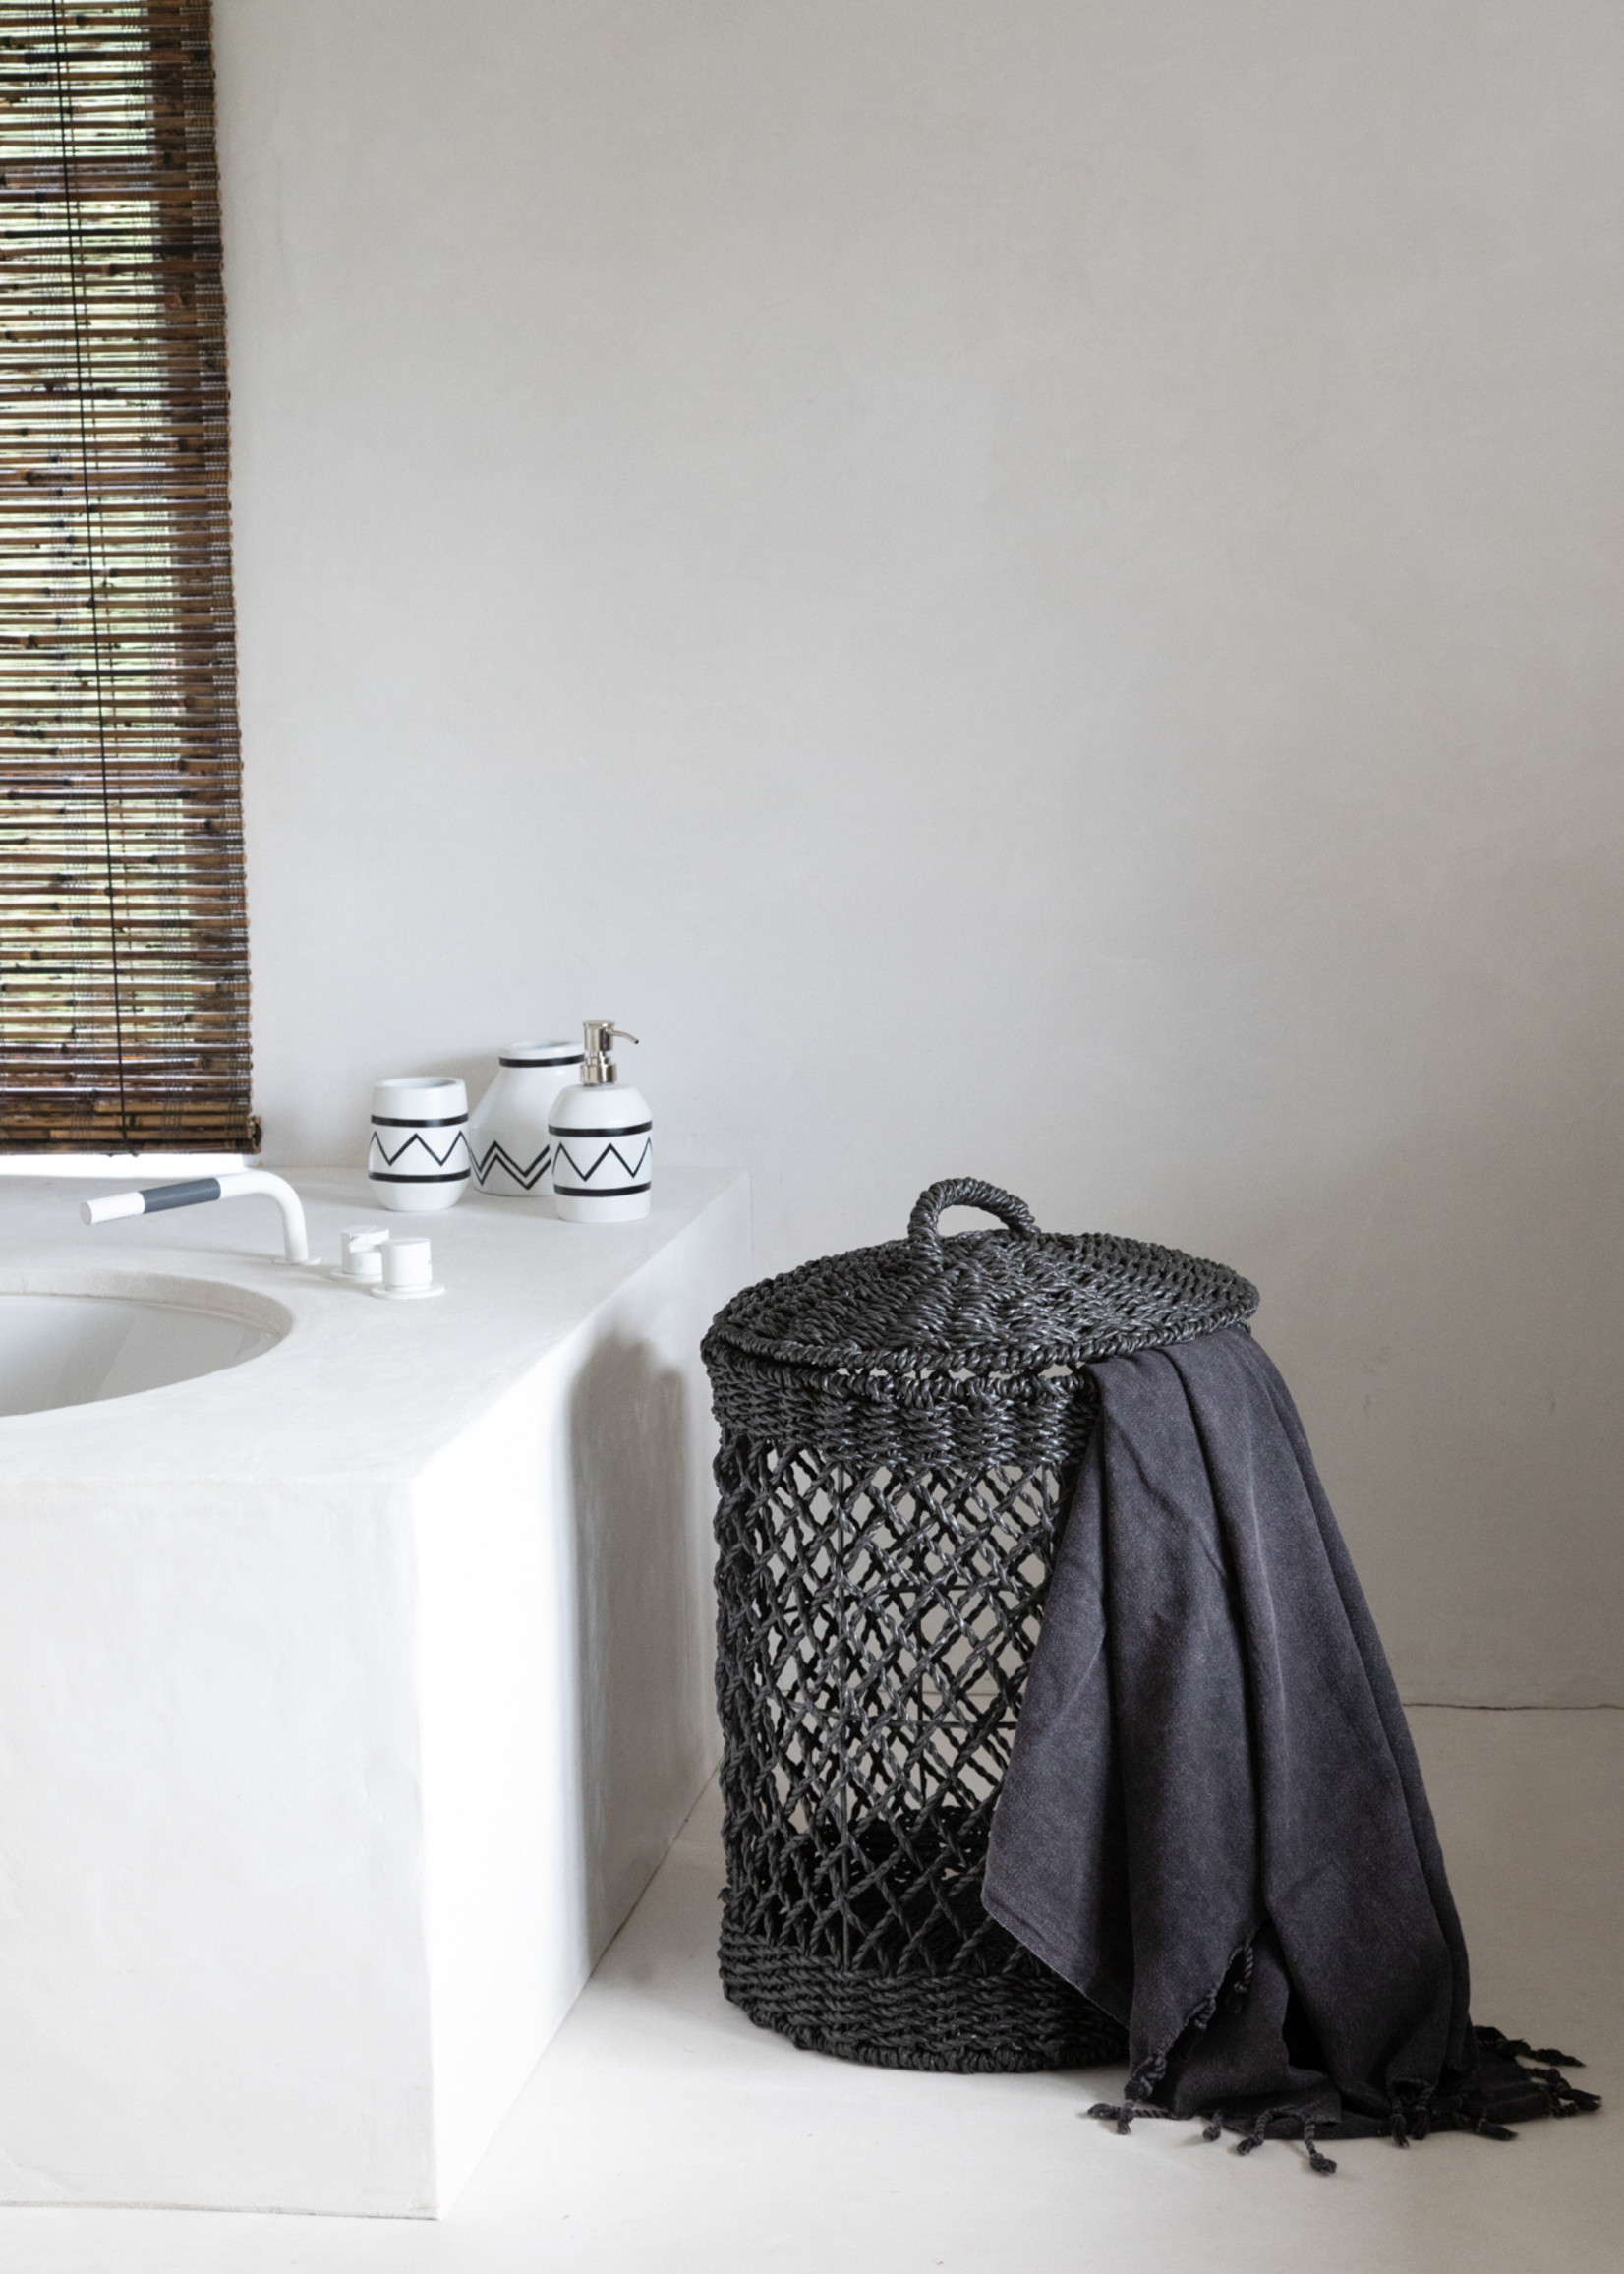 The Santorini Bathroom Mug -  White Black